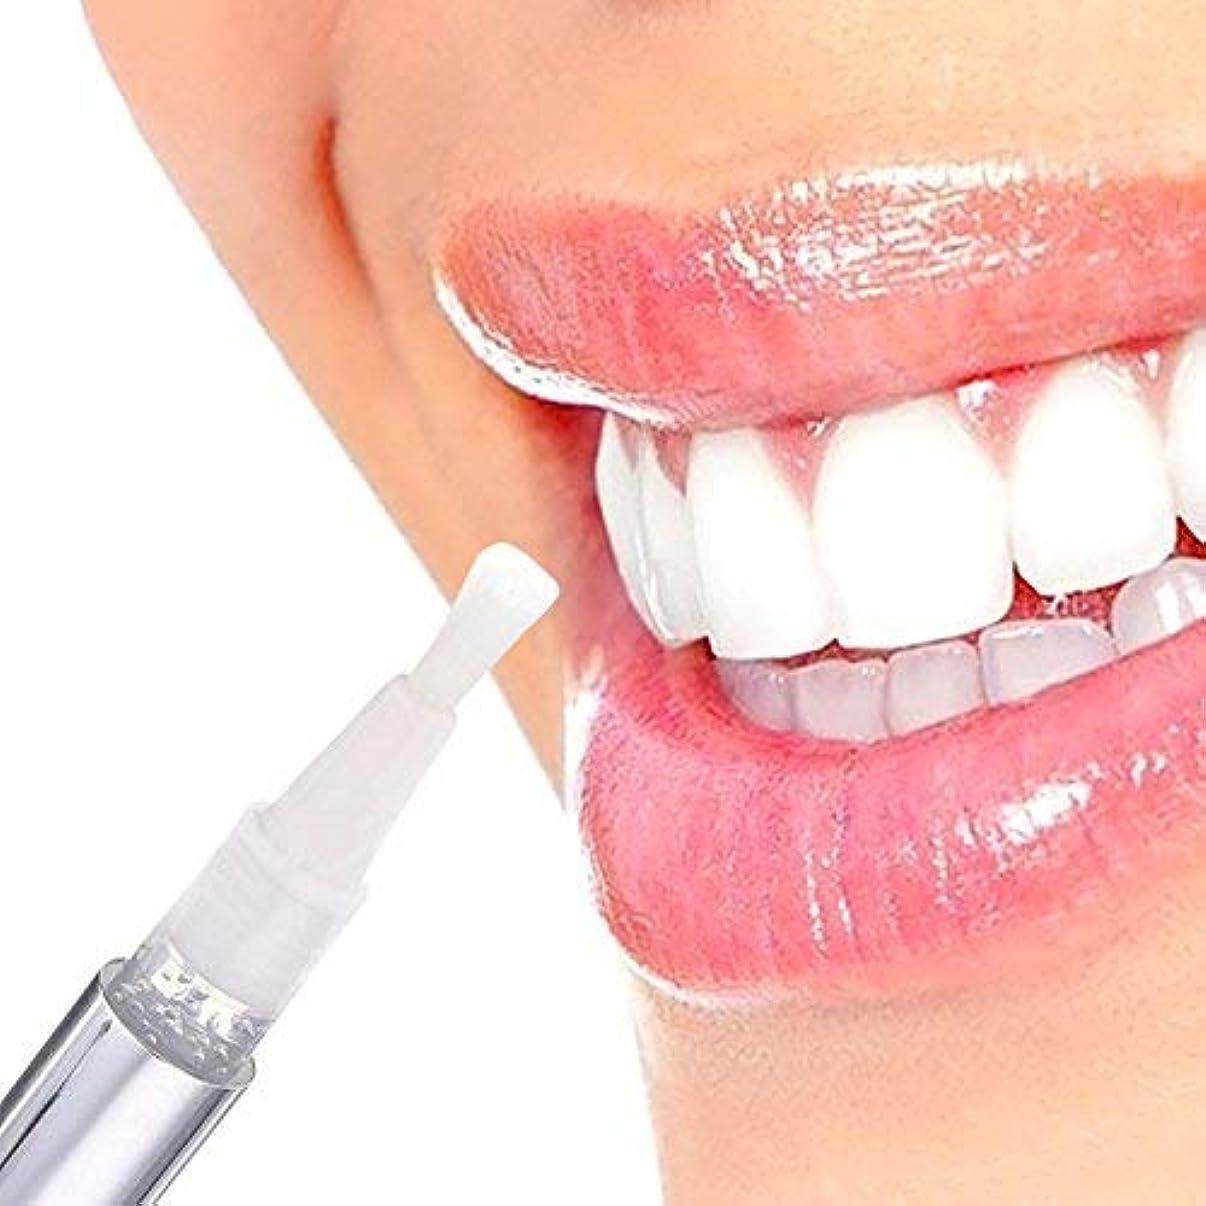 Nat 1PCS Hot Creative Effective Teeth Whitening Pen Tooth Gel Whitener Bleach Stain Eraser Sexy Celebrity Smile...